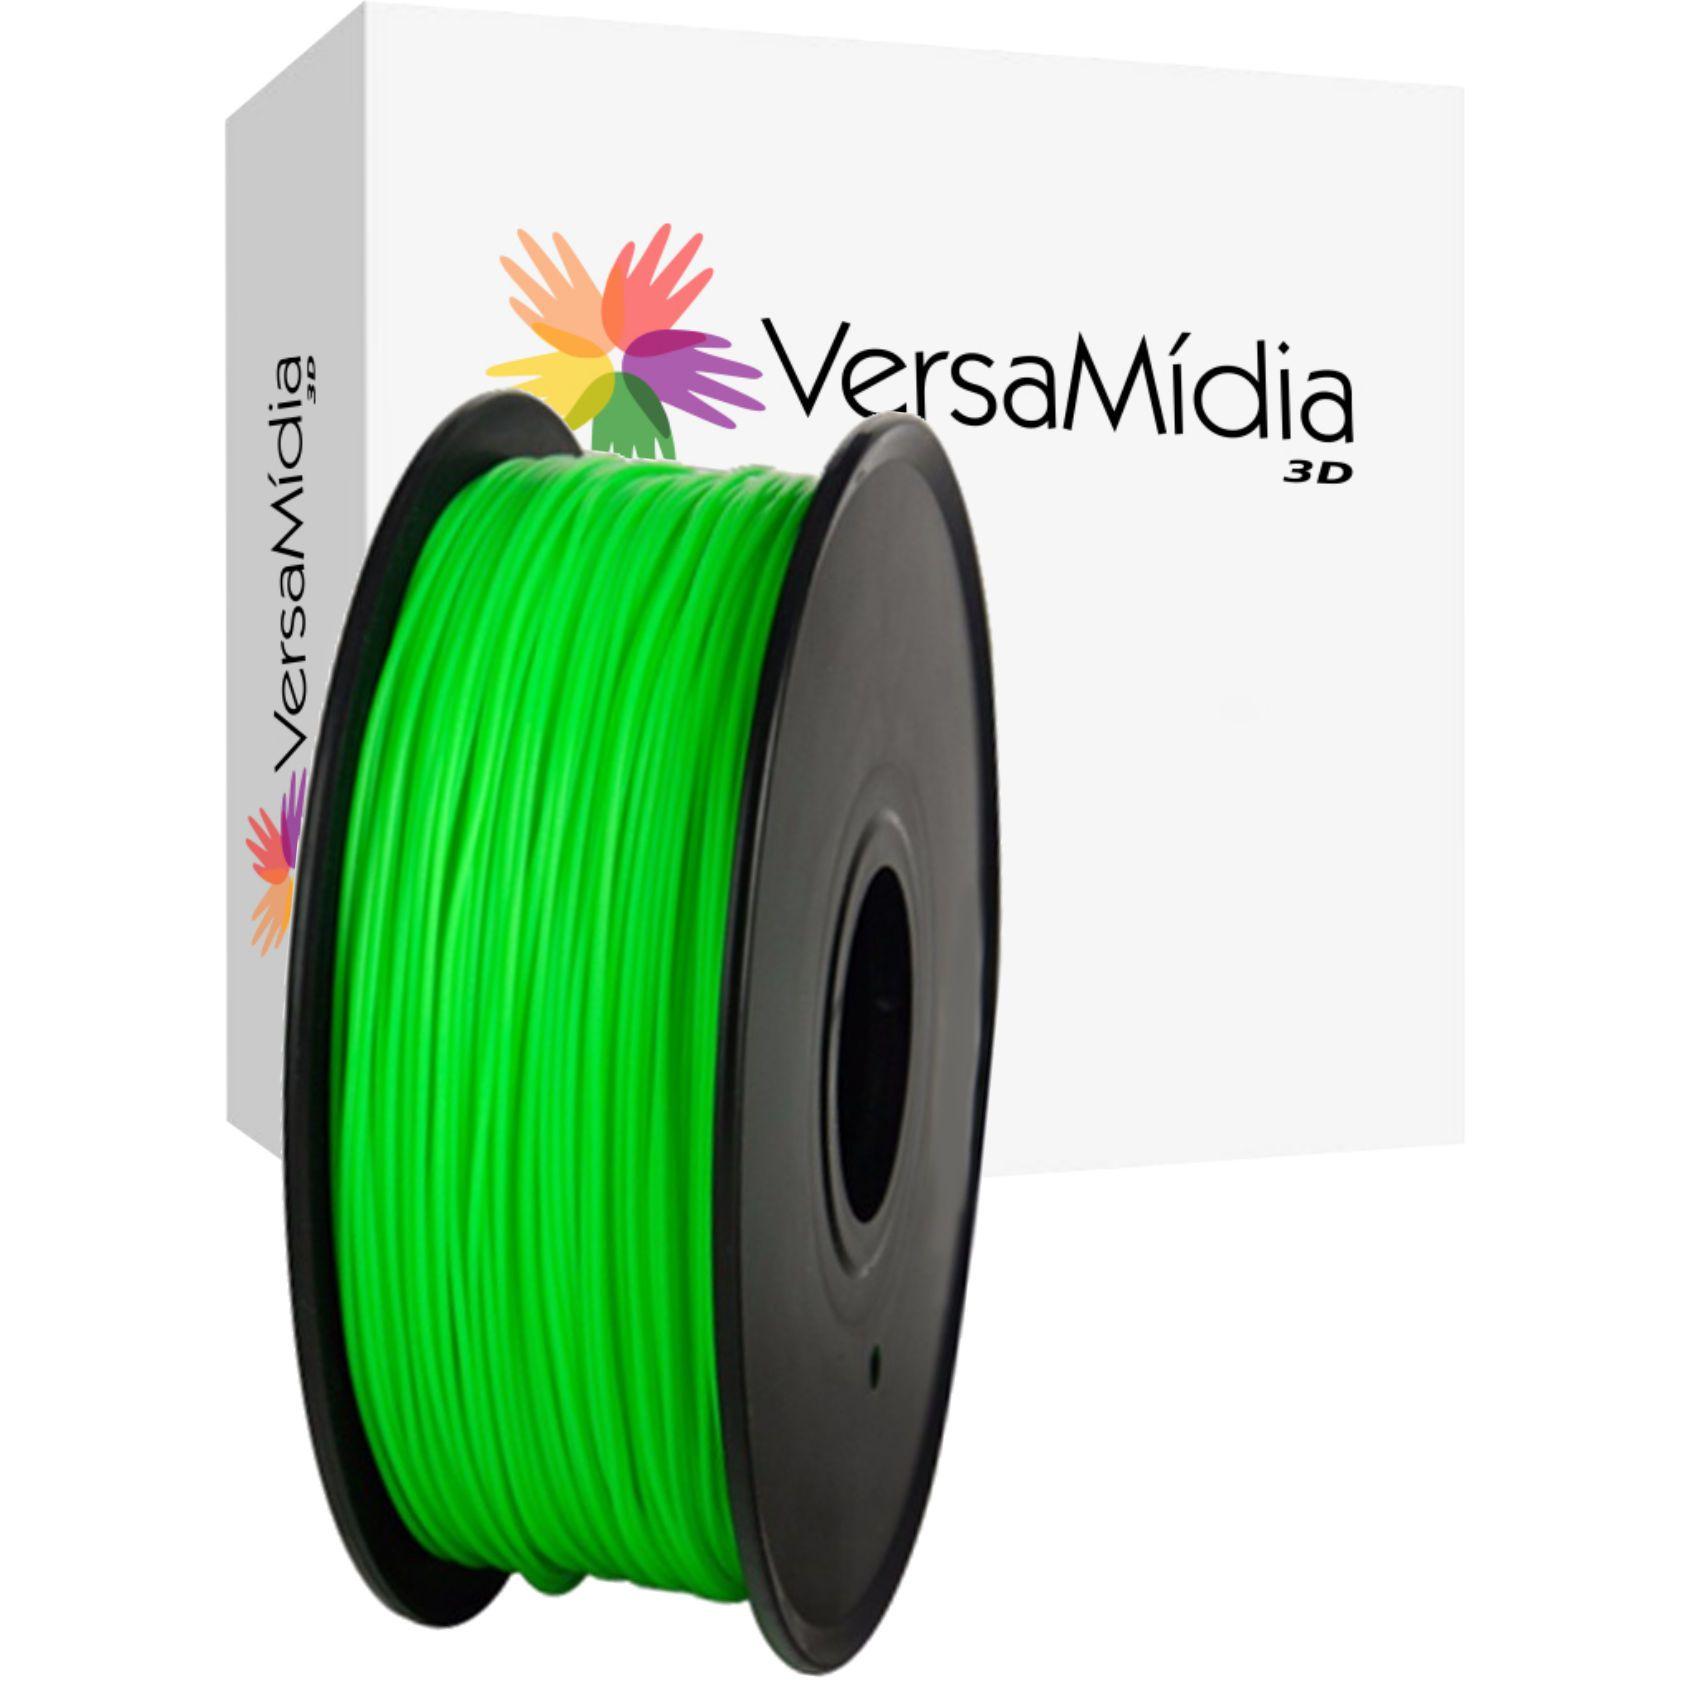 Filamento PLA Fluorescente VersaMídia 3D Premium  1.75mm Black Spool